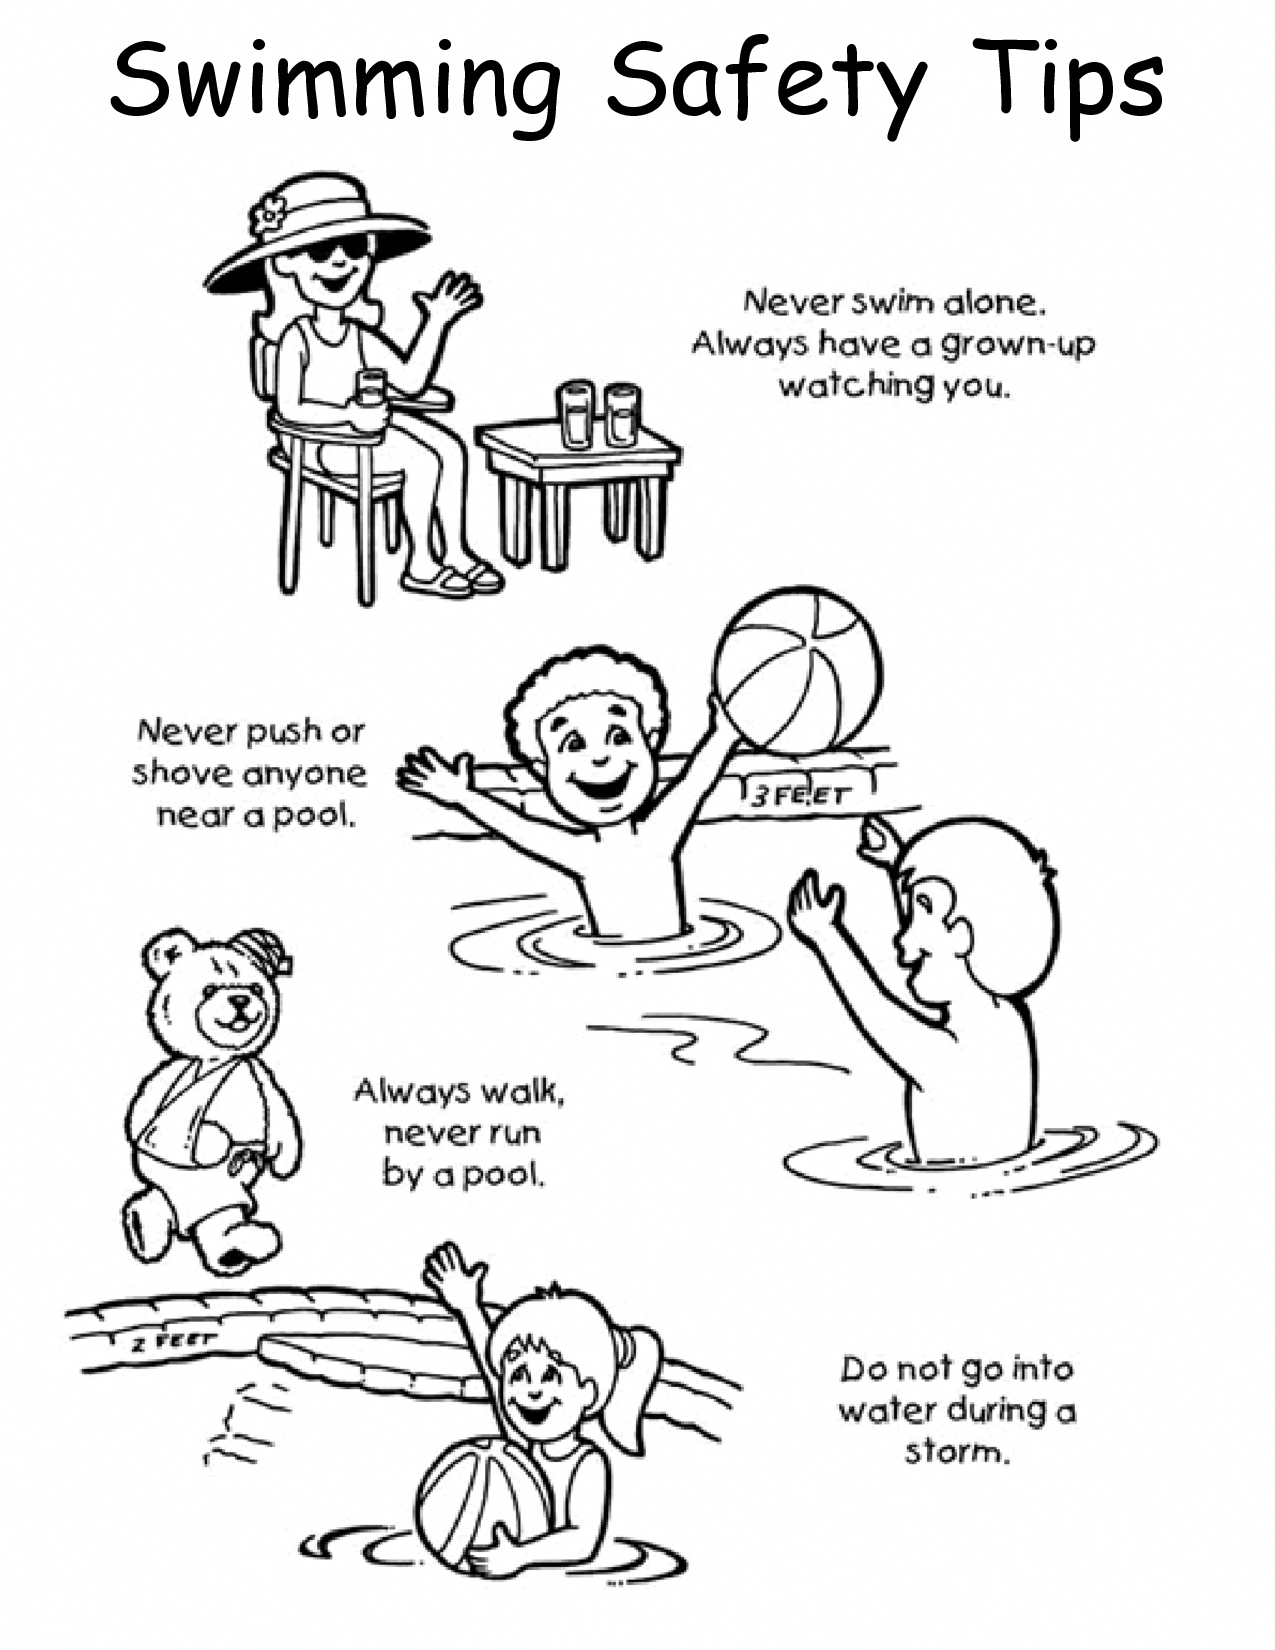 Preparedness Techniques And Strategies For Diy Garden Crafts Diygardencrafts Summer Safety Swimming Safety Water Safety [ 1650 x 1275 Pixel ]